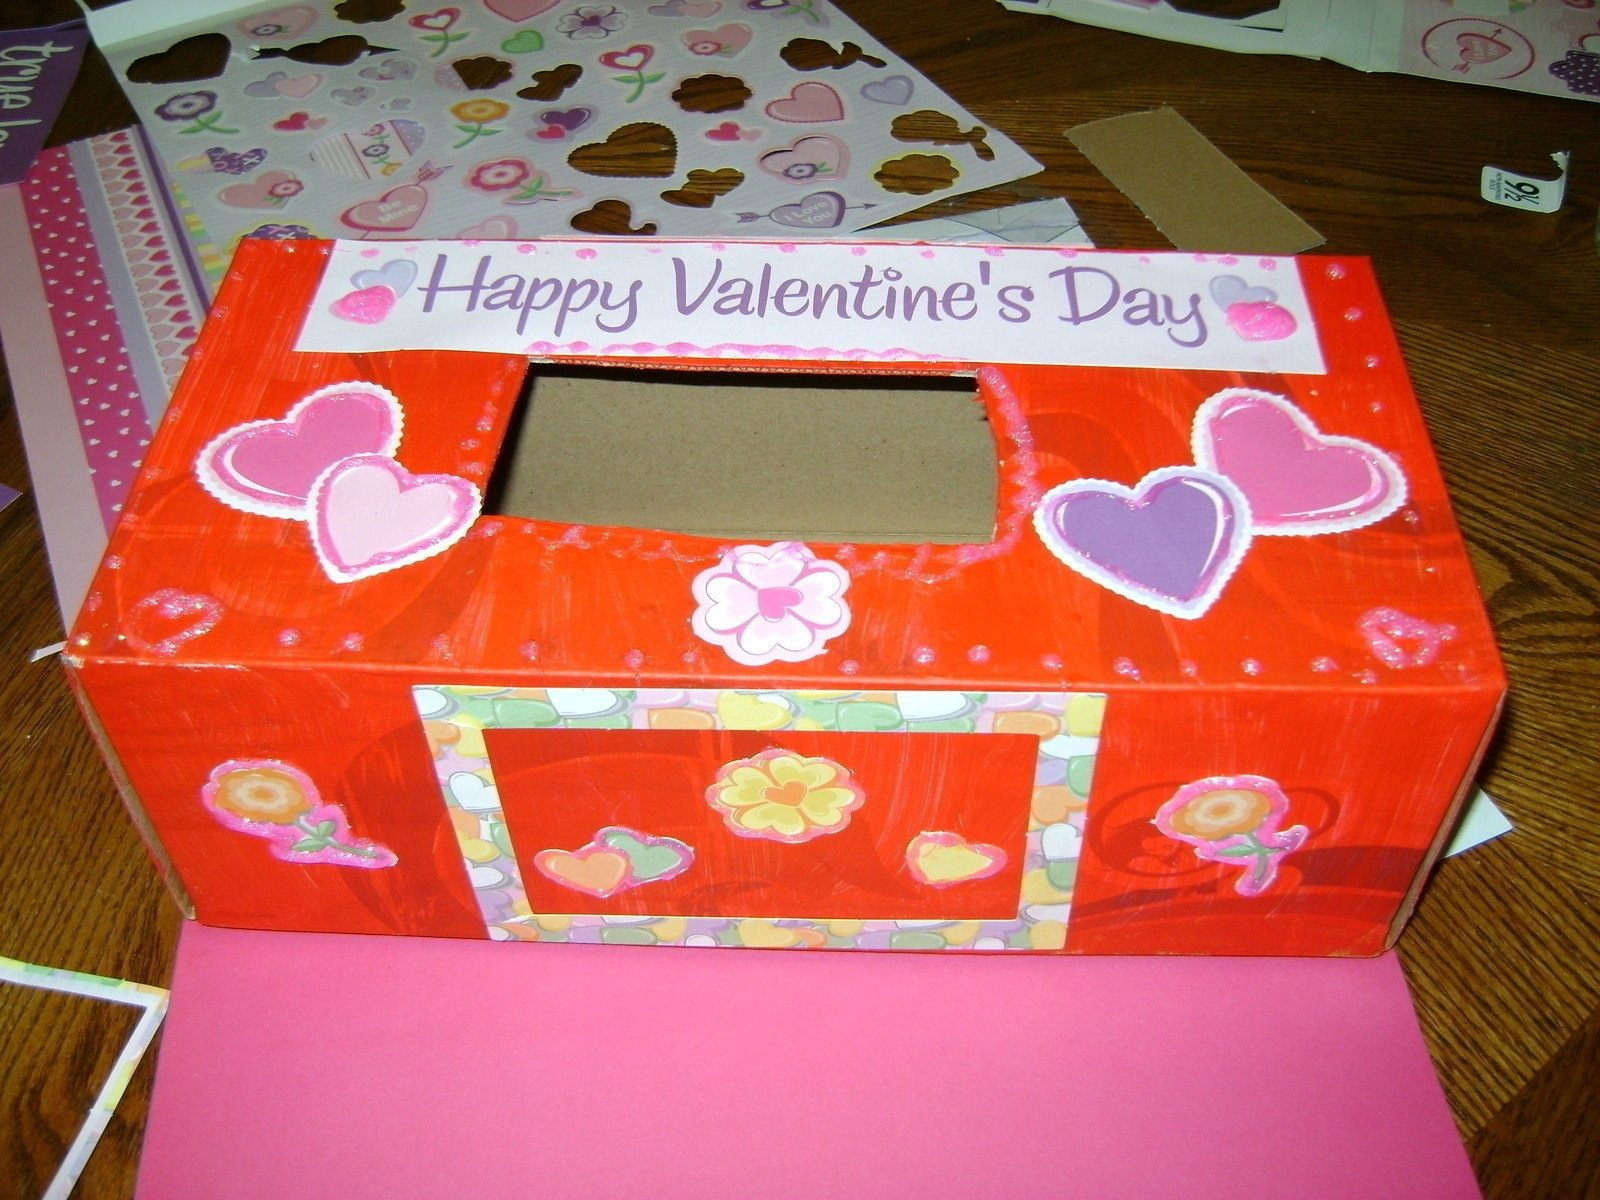 10 Stylish Valentine Shoe Box Decorating Ideas valentines box c2b7 how to make a decoupage box c2b7 decorating on cut out 2021